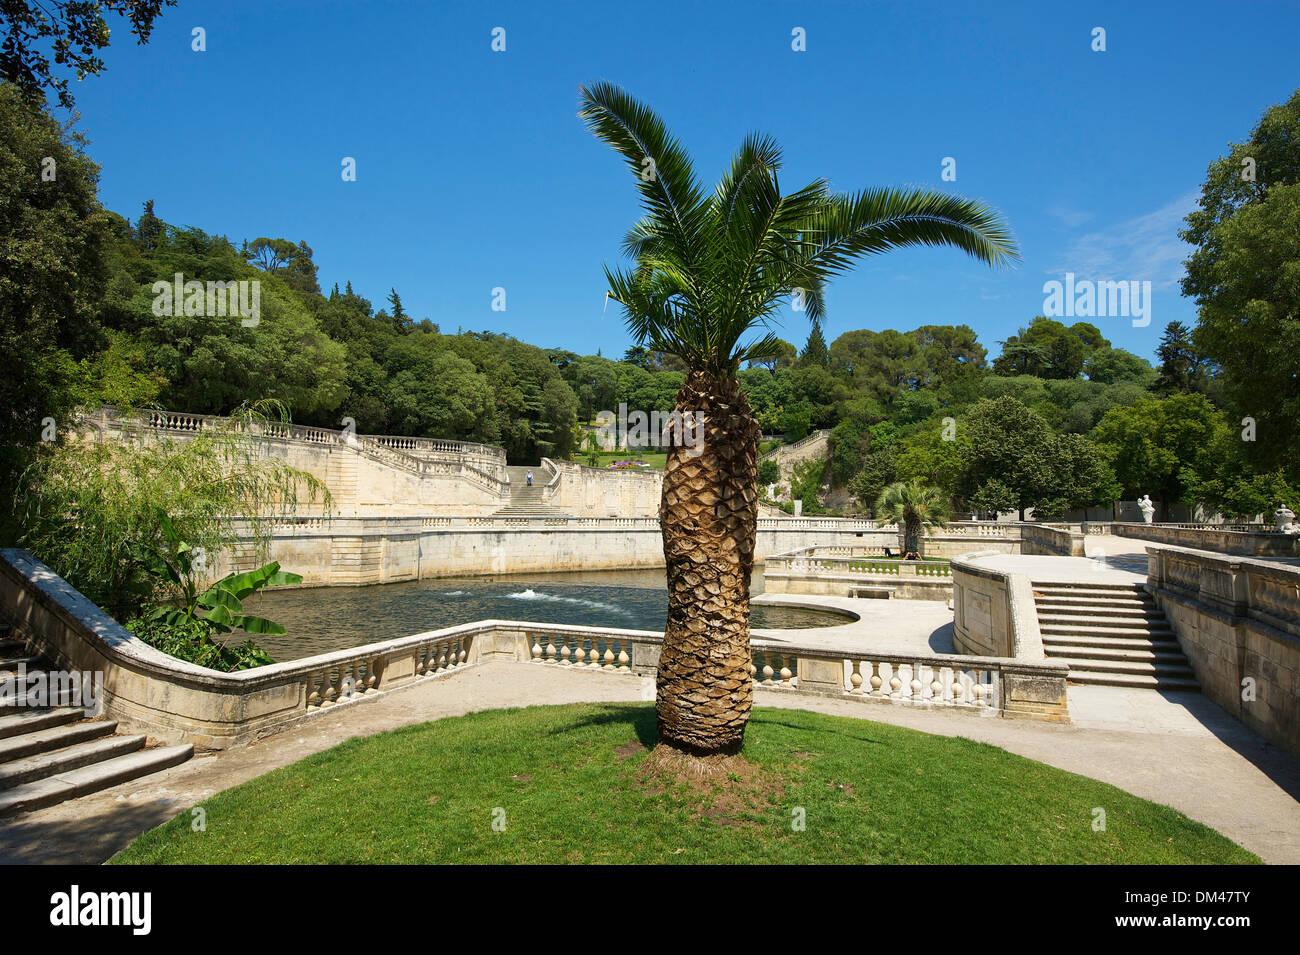 France europe provence south of france jardin de la fontaine nimes stock photo royalty free - Petit jardin proven nimes ...